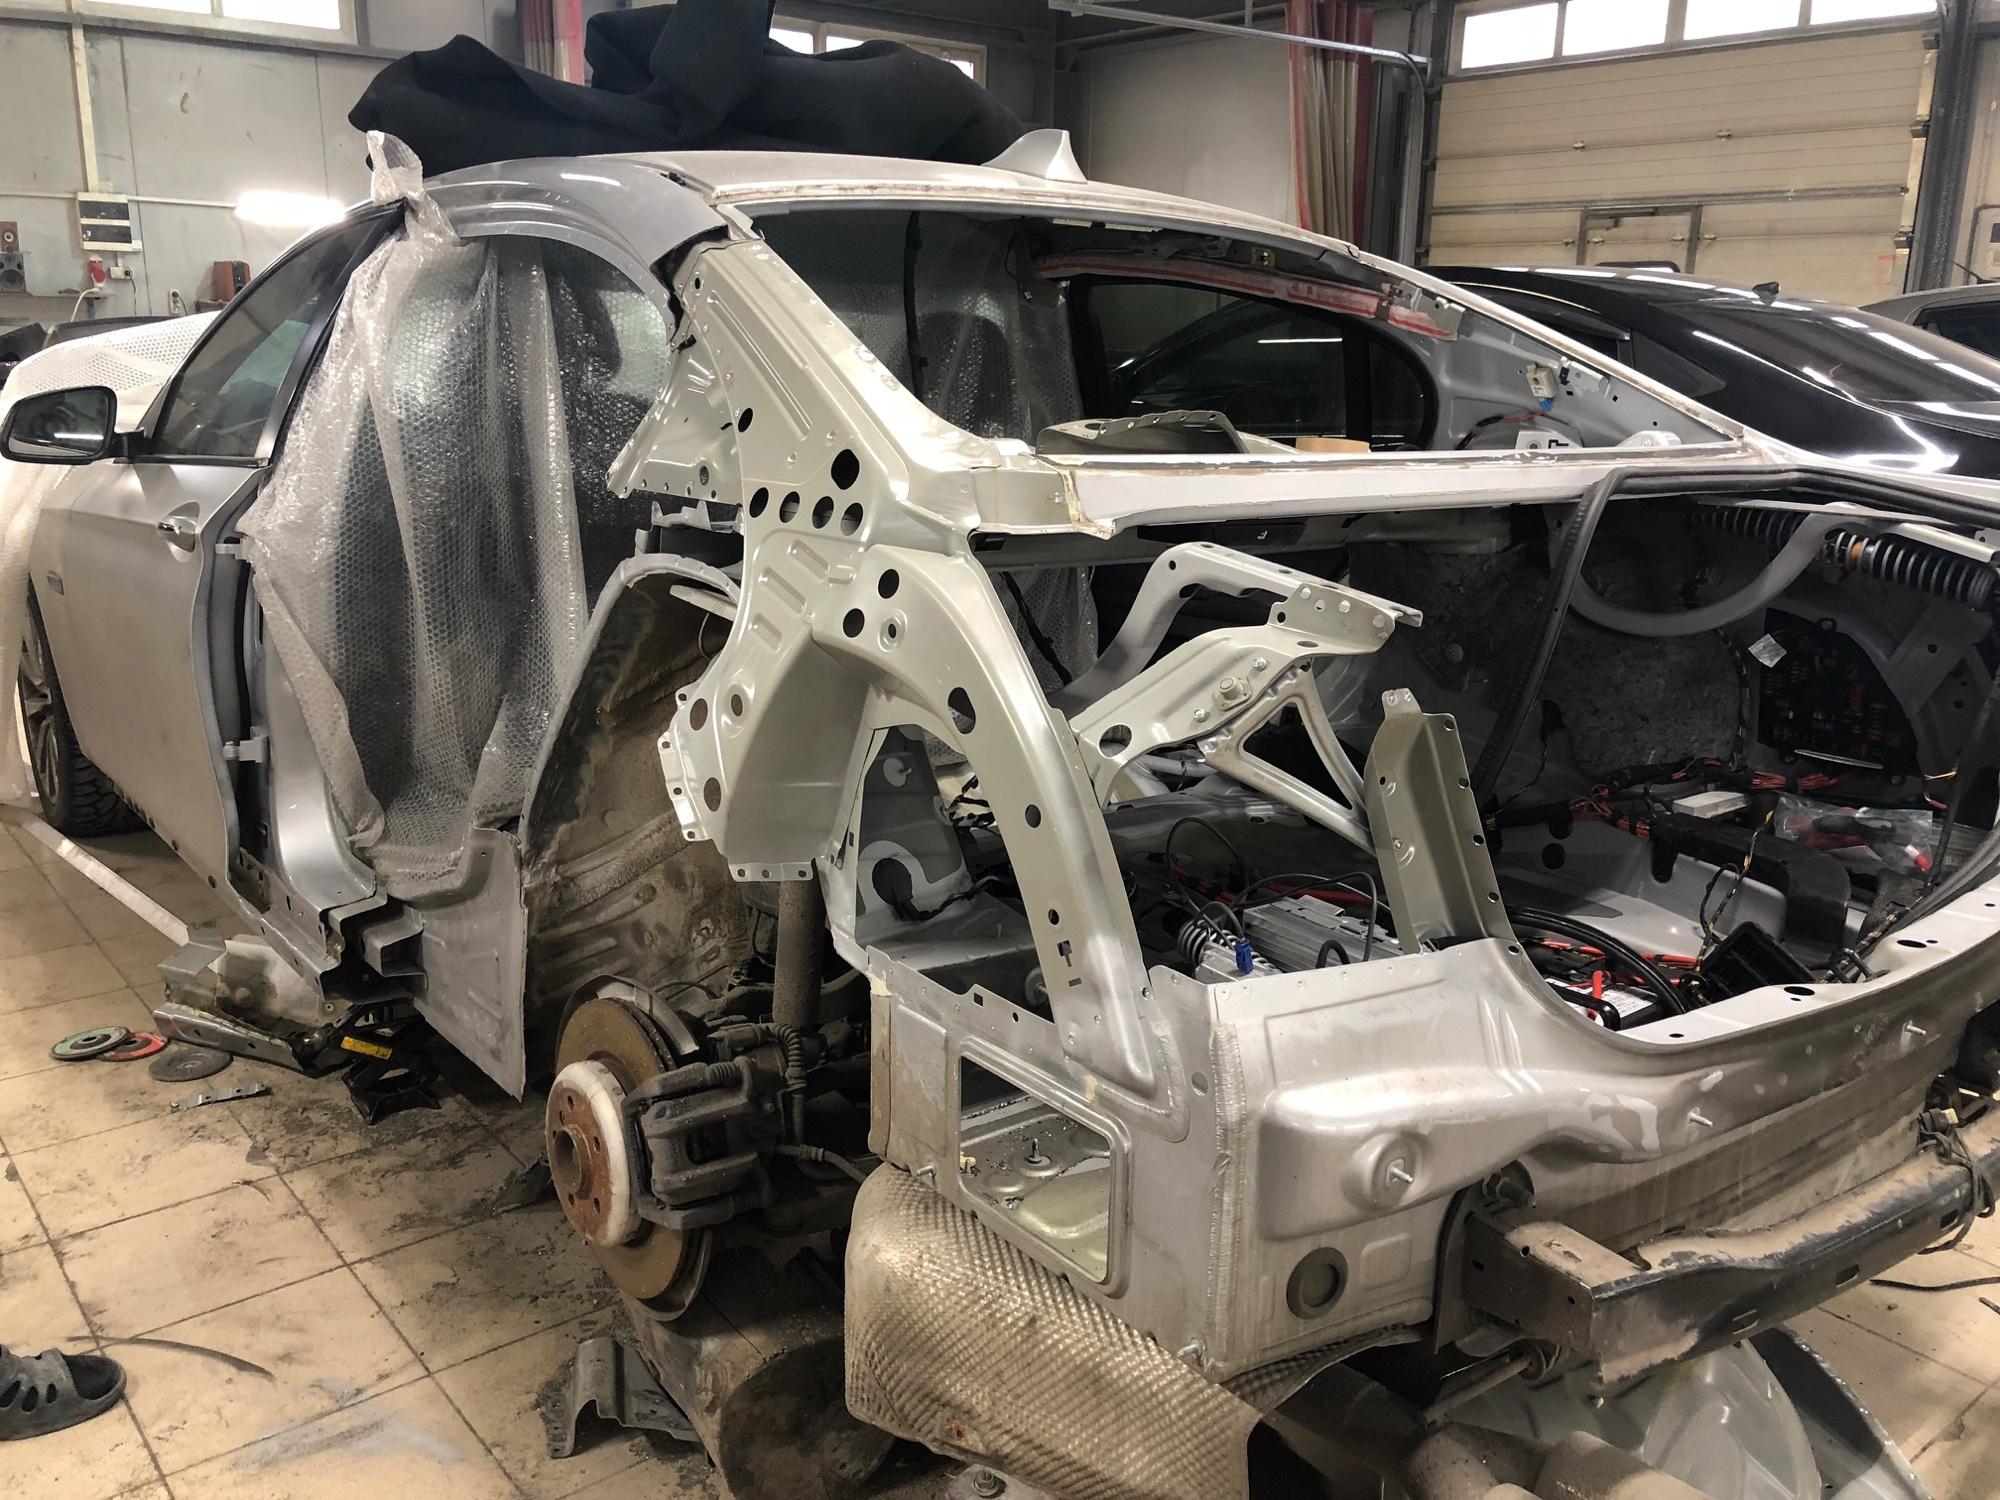 BMW 5 Series. Ремонт задней части на стапеле